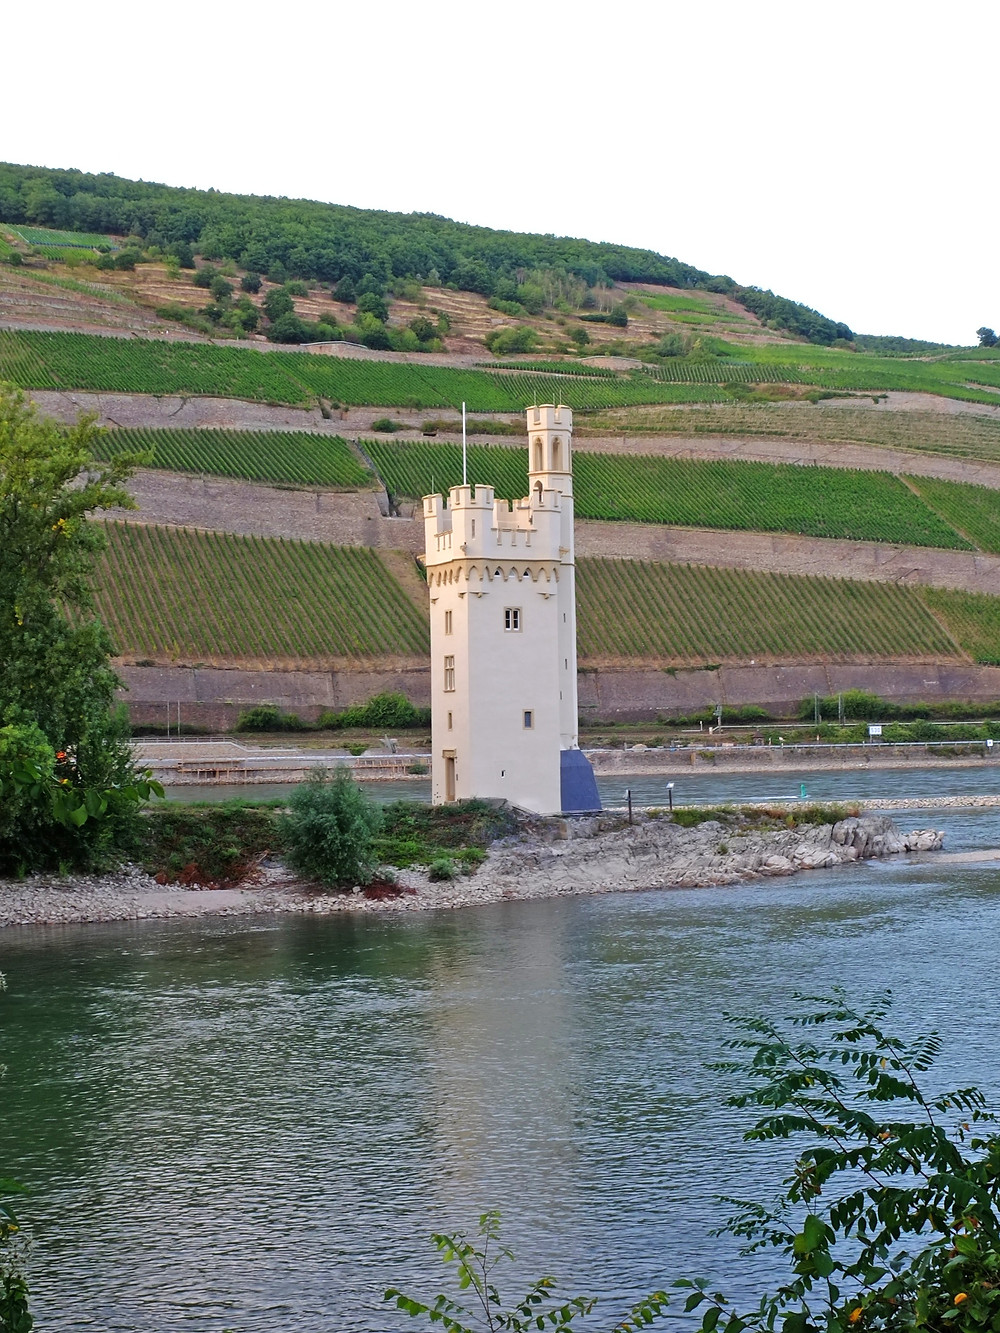 HOLIDAY OKAY | Mäuseturm Bingen am Rhein